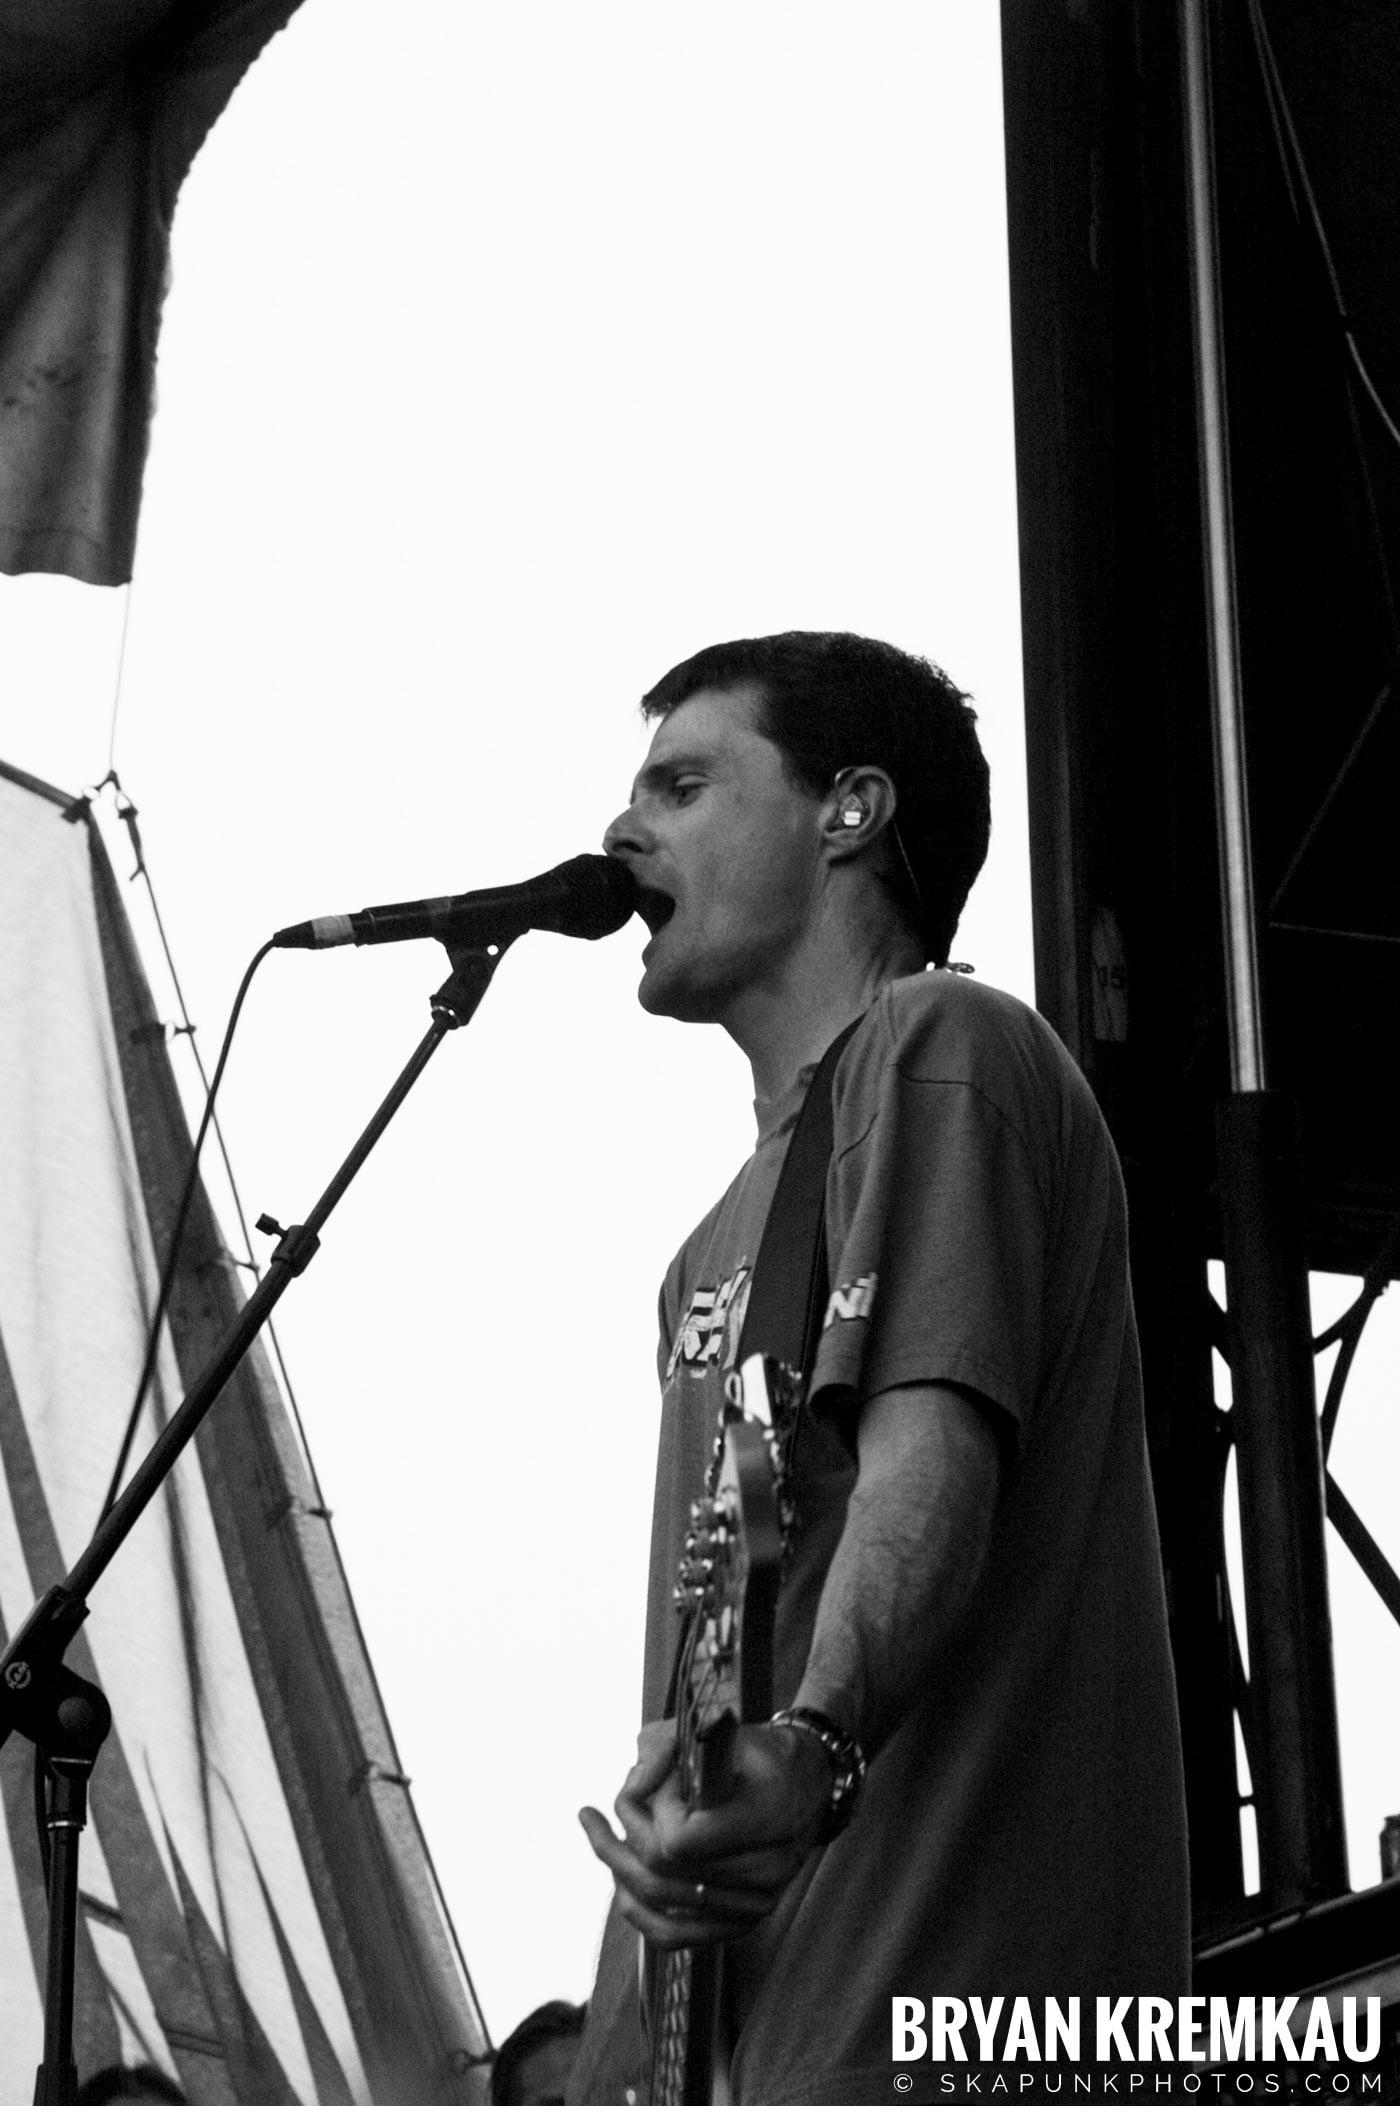 The Offspring @ Warped Tour 05, NYC - 8.12.05 (8)